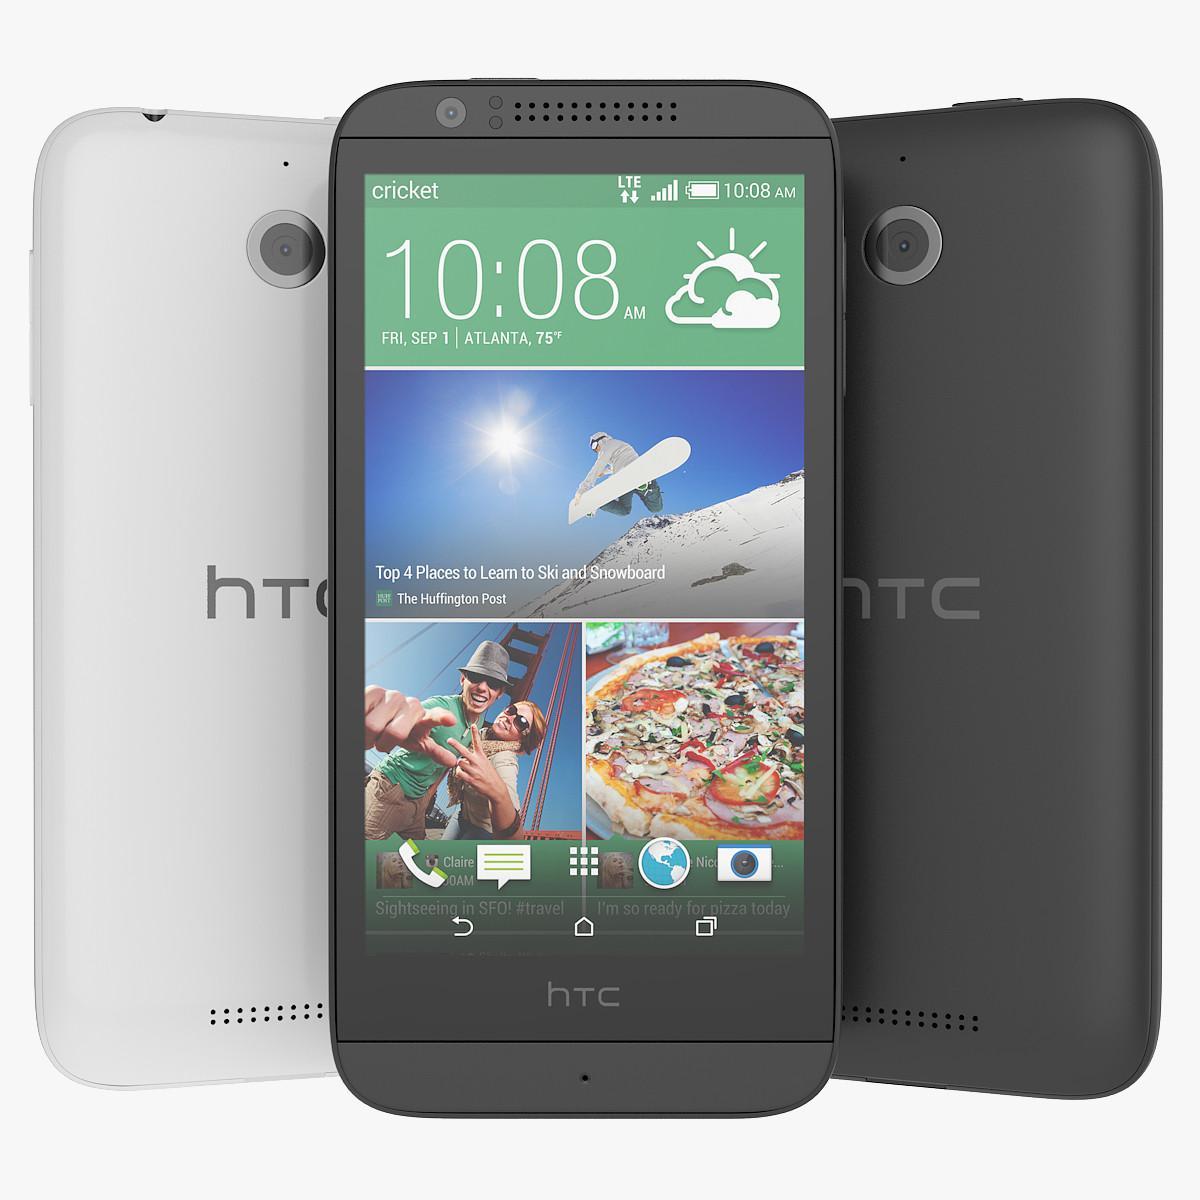 HTC_510_004all.jpg